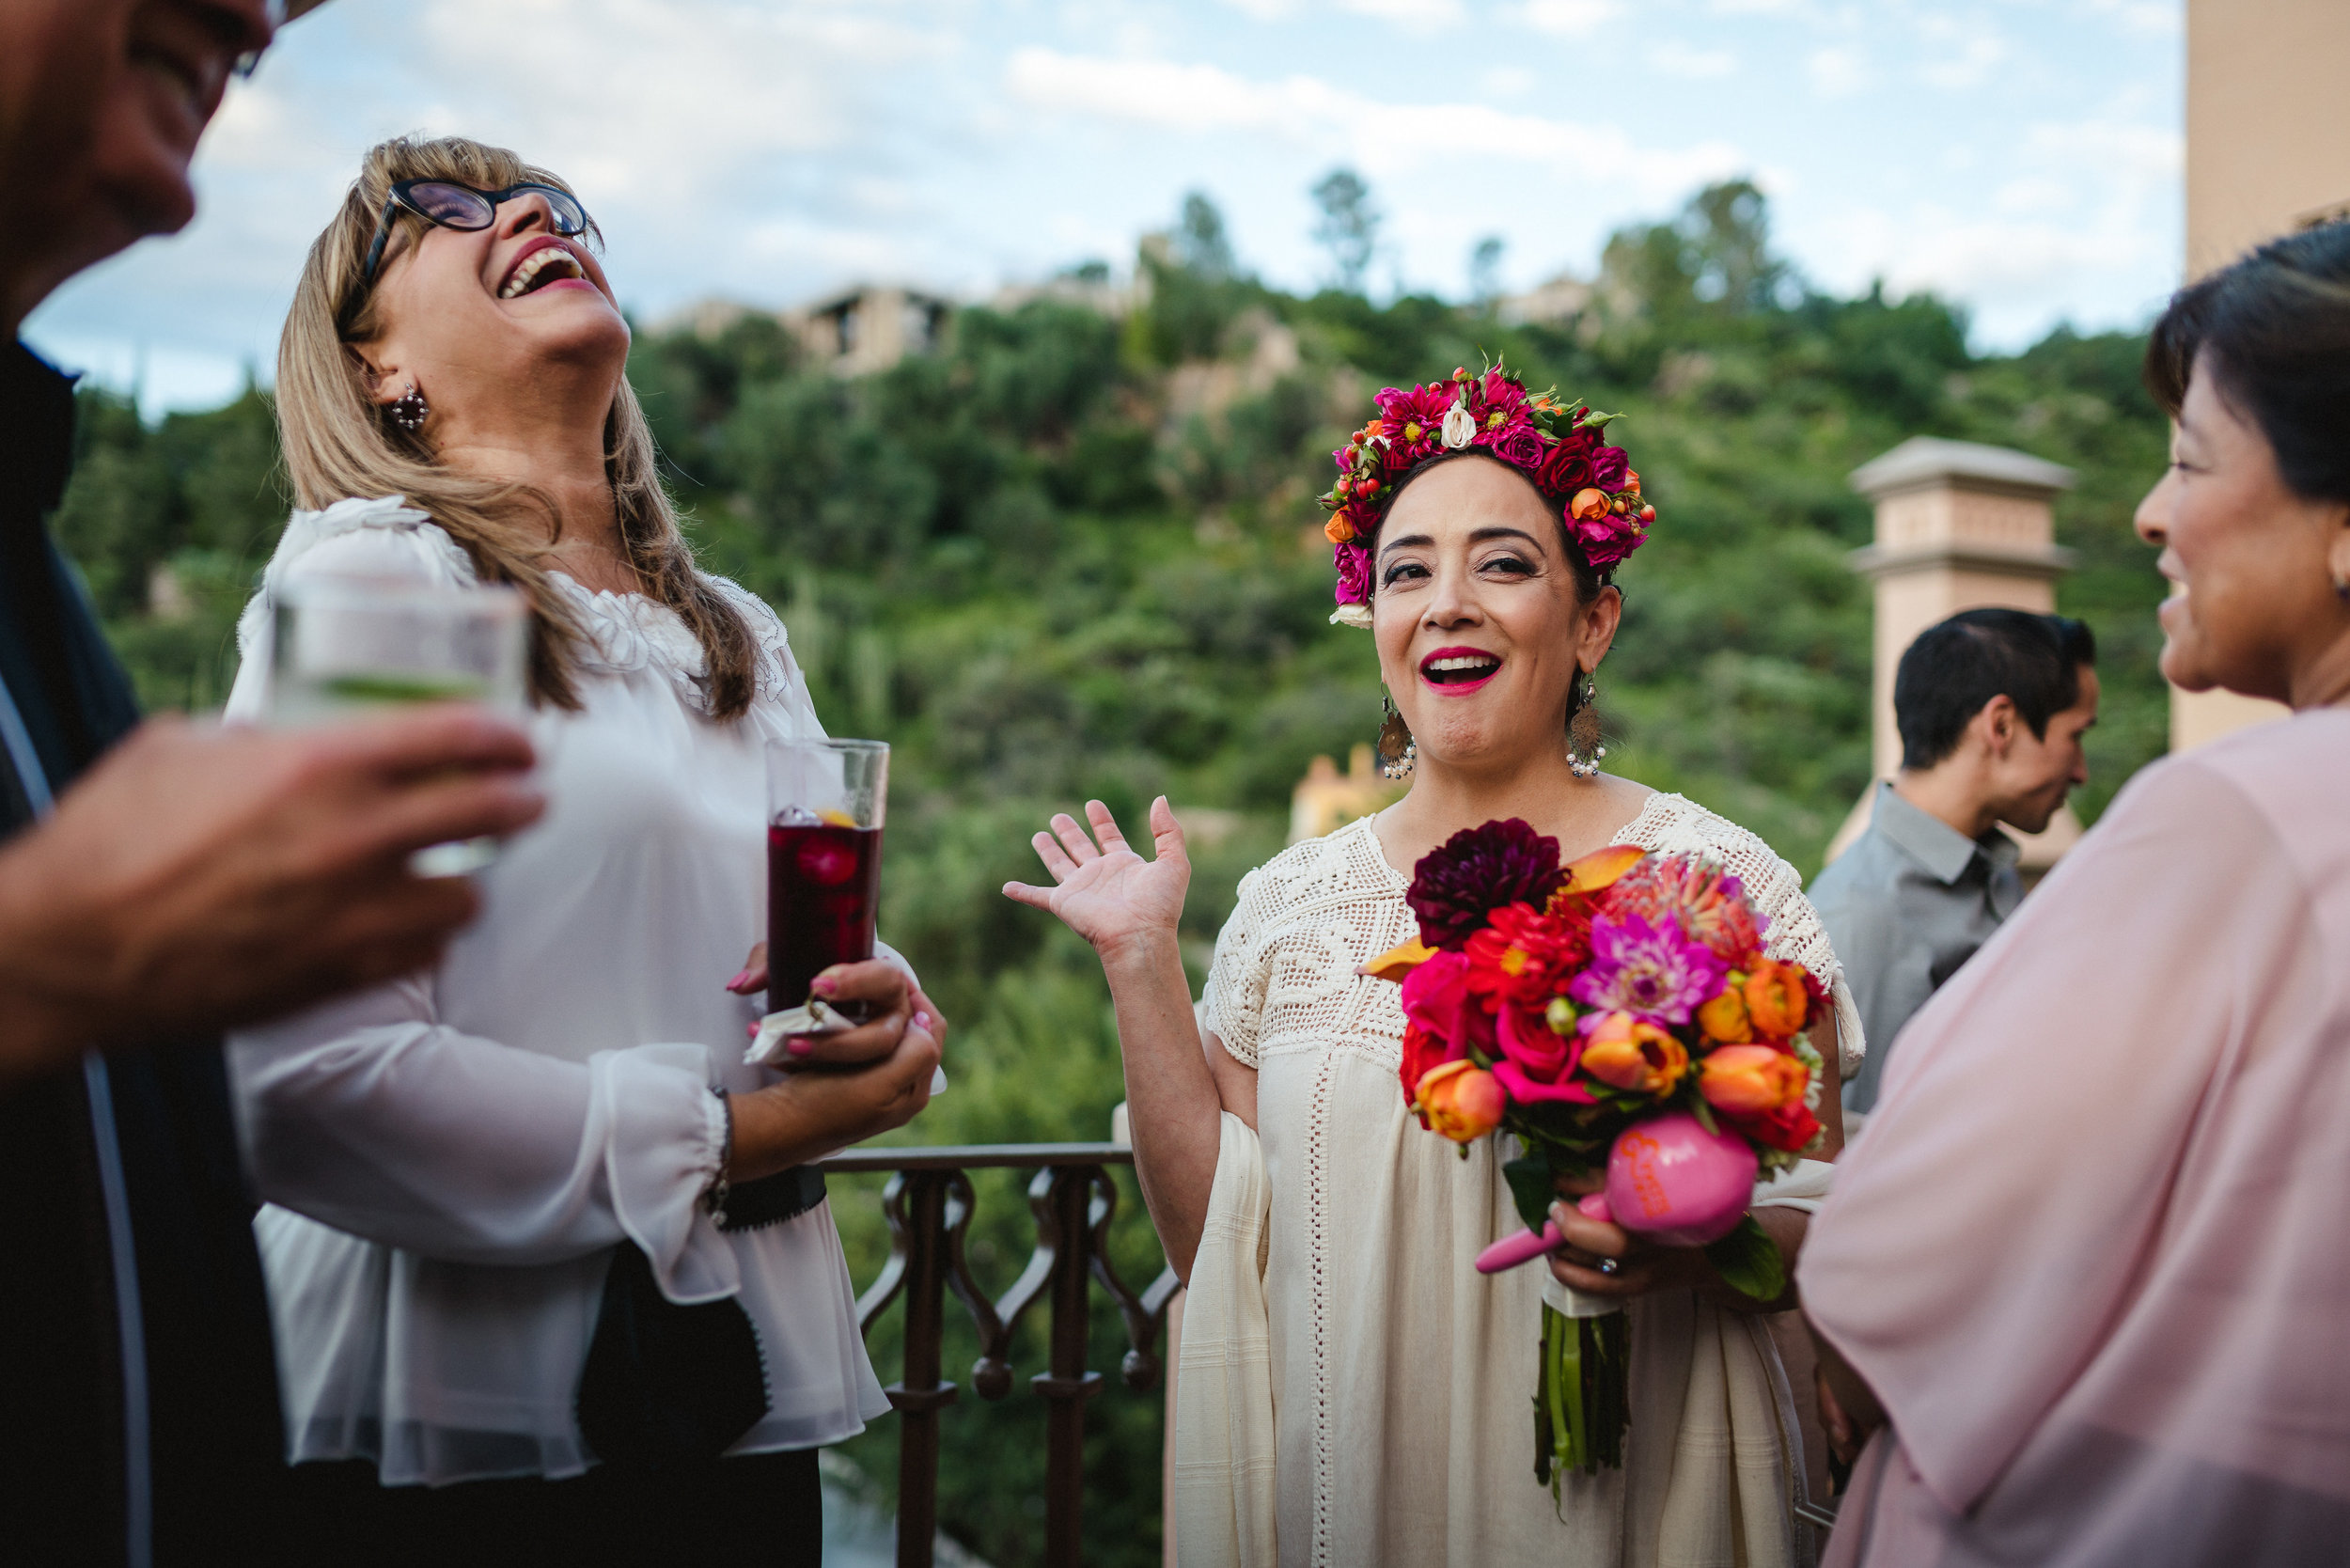 MaurizioSolisBroca-casa-carino-san-miguel-de-allende-wedding-77.jpg